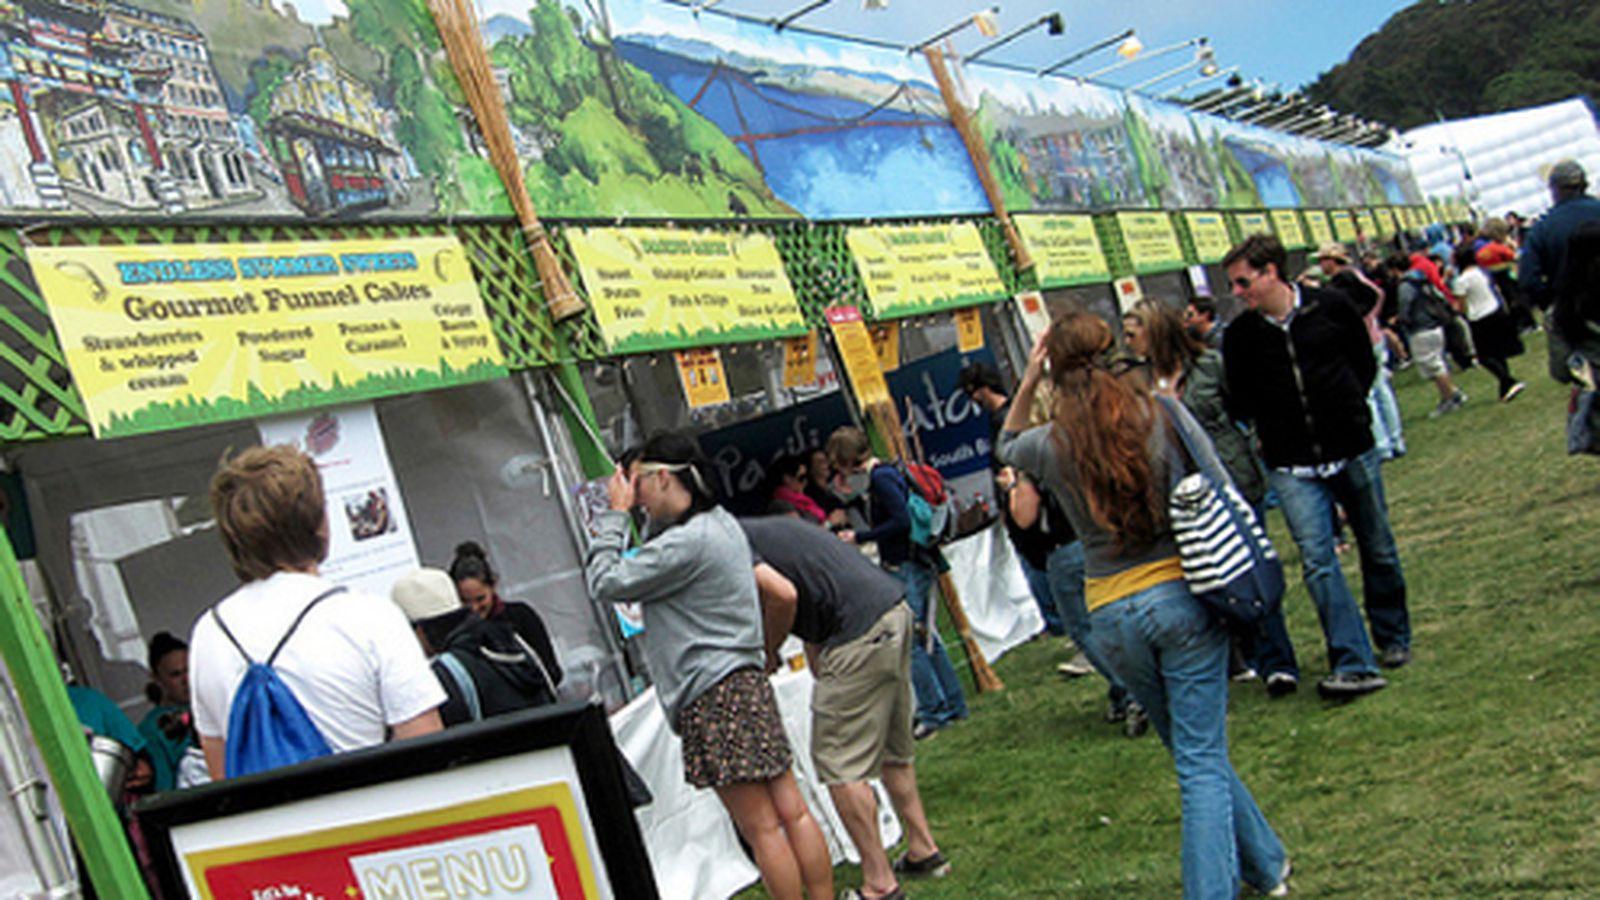 Outside Lands Adds Beer Lands, Ten New Food Vendors - Eater SF